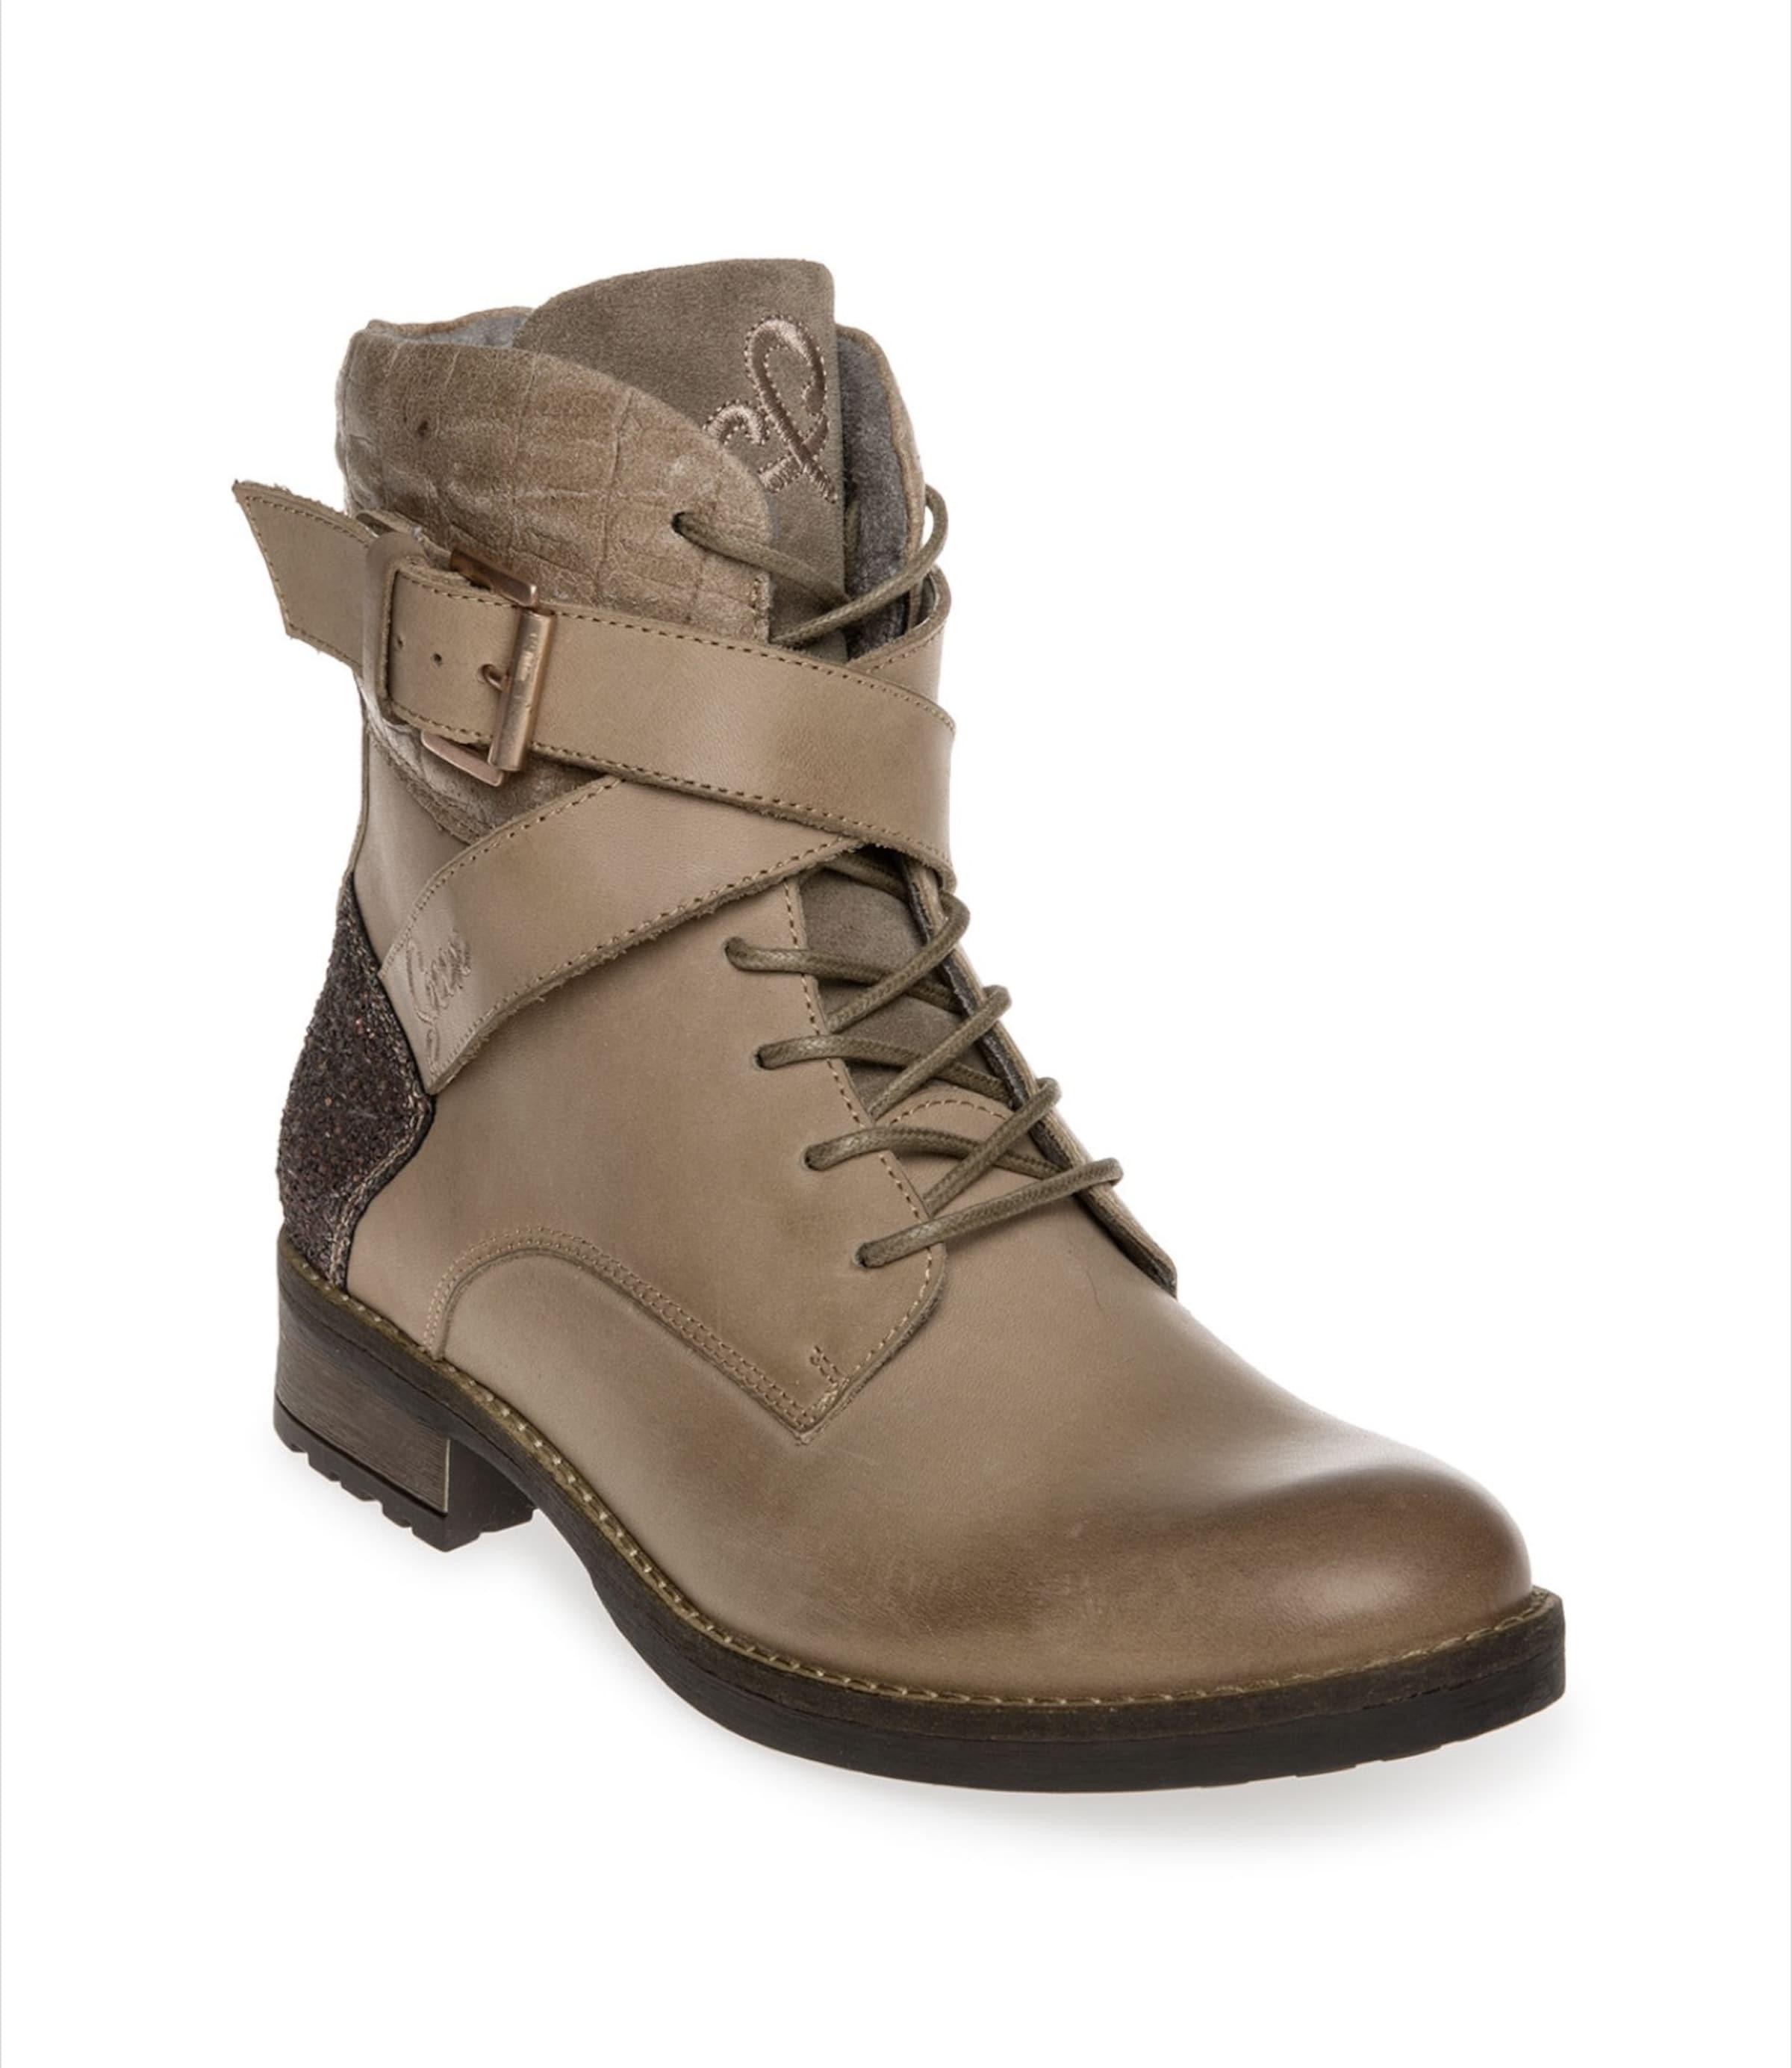 In Soccx Soccx ChamoisDunkelbraun Boots In Boots ChamoisDunkelbraun Soccx Soccx ChamoisDunkelbraun Boots In hxBsrtQdC